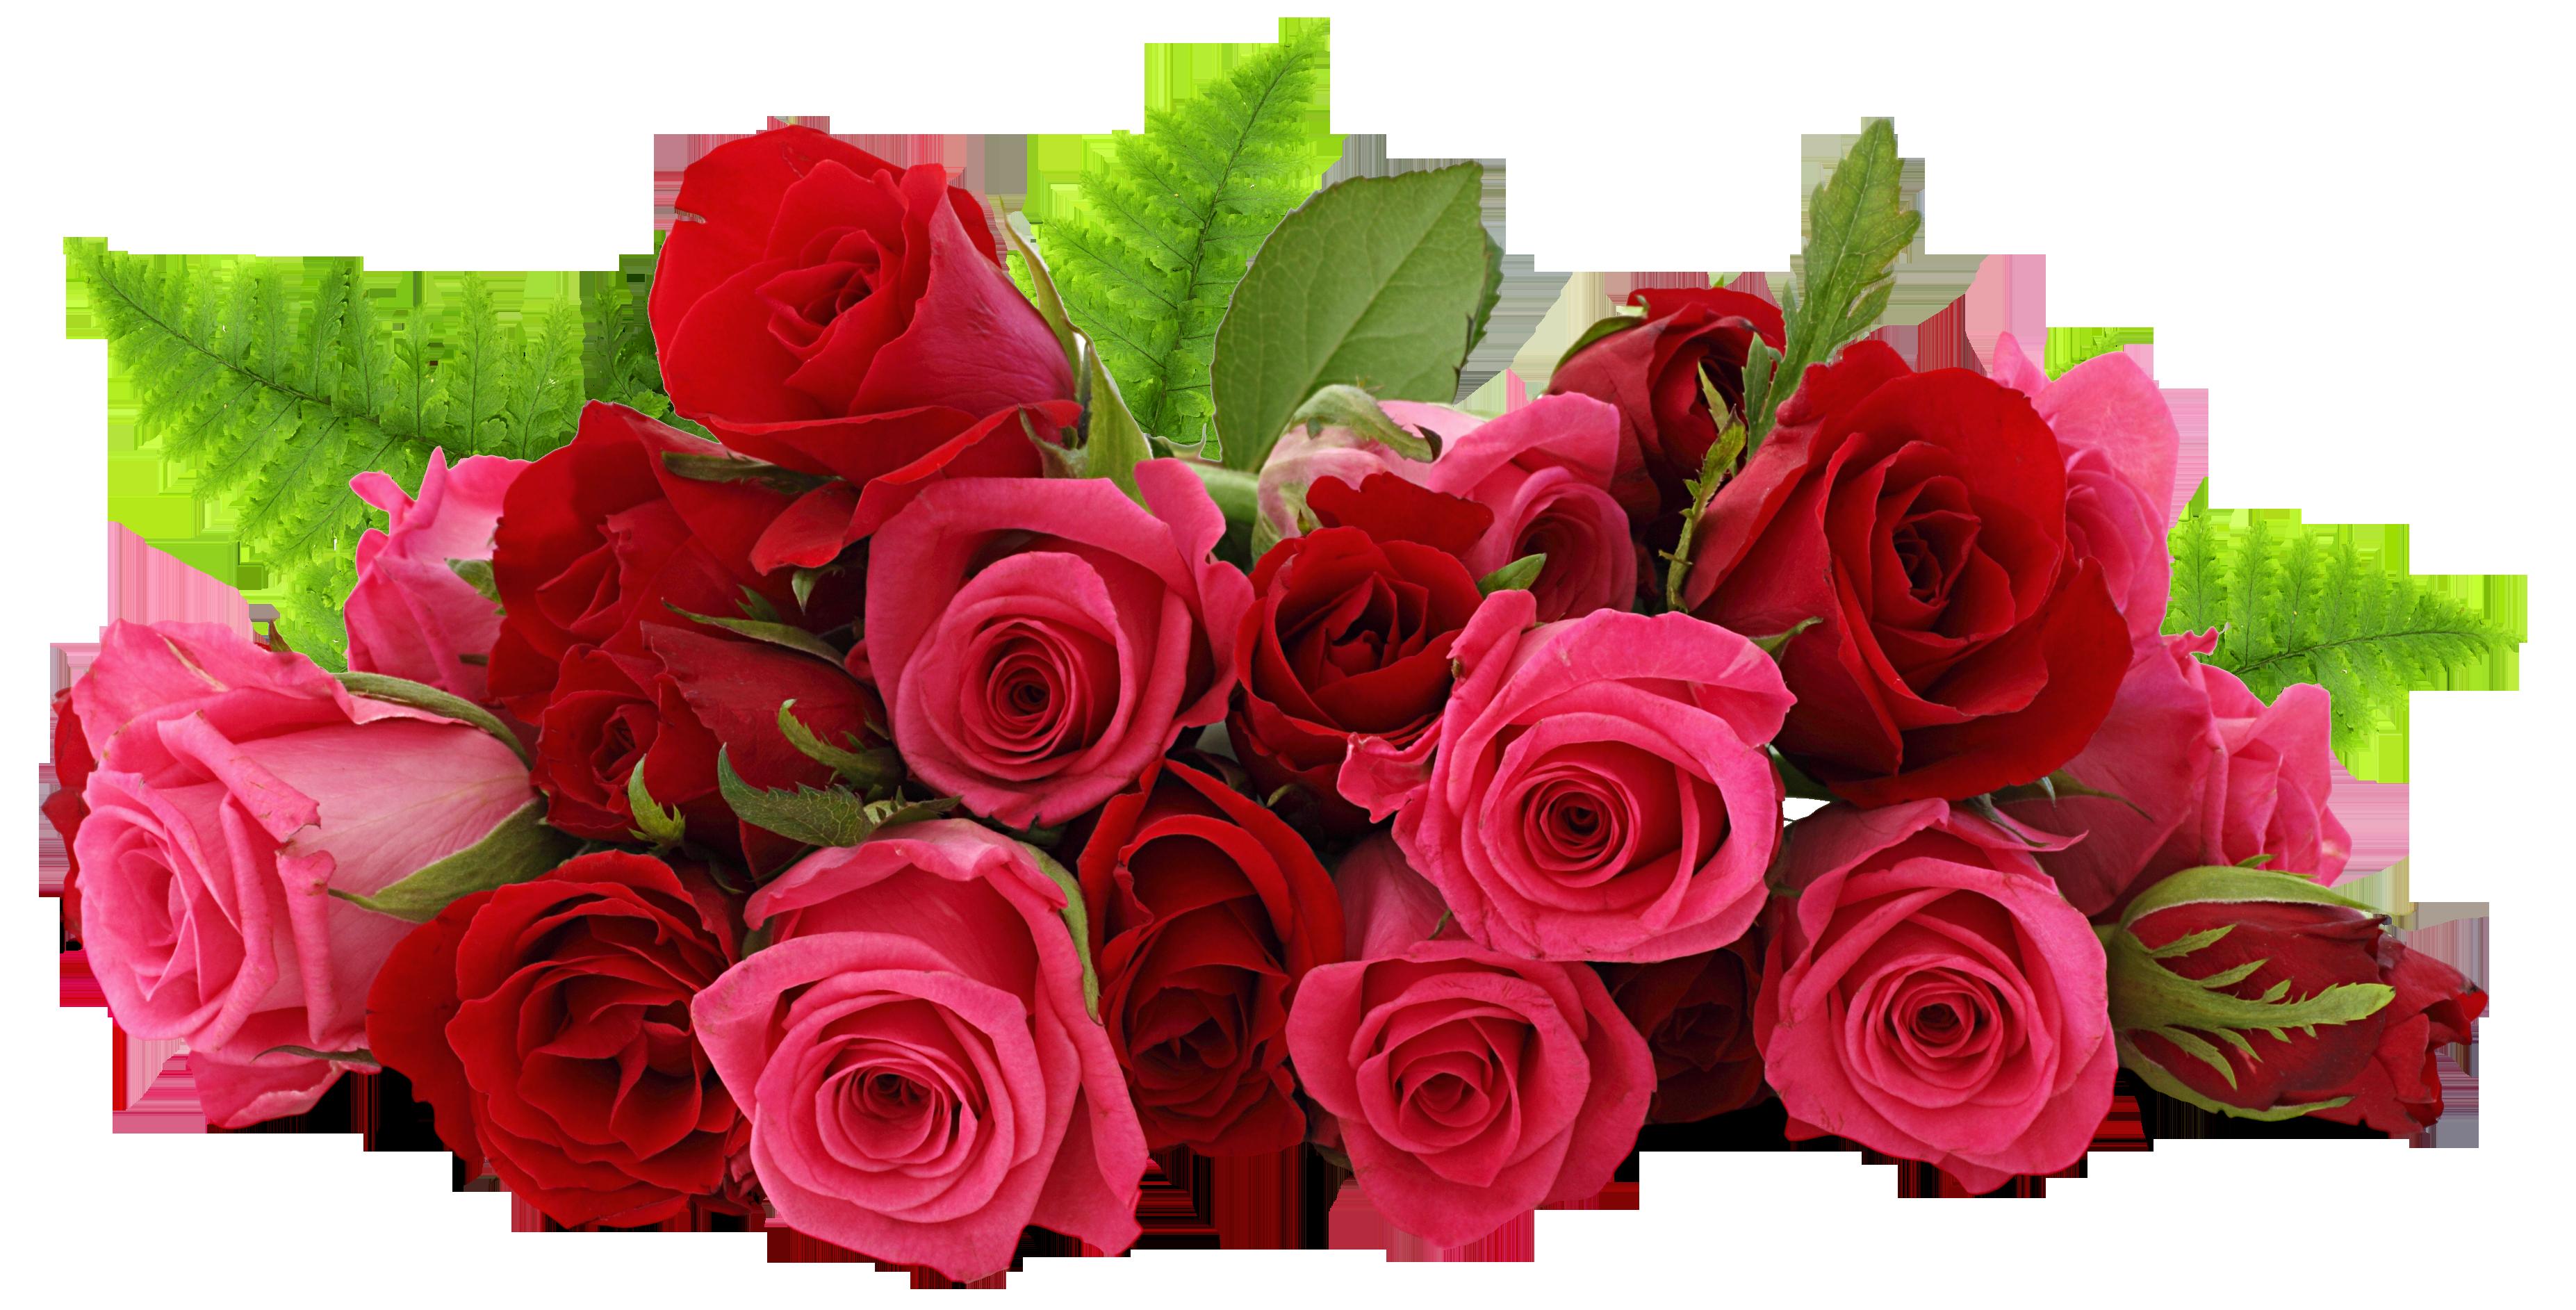 Wedding Roses Png image #39860 - Rose PNG